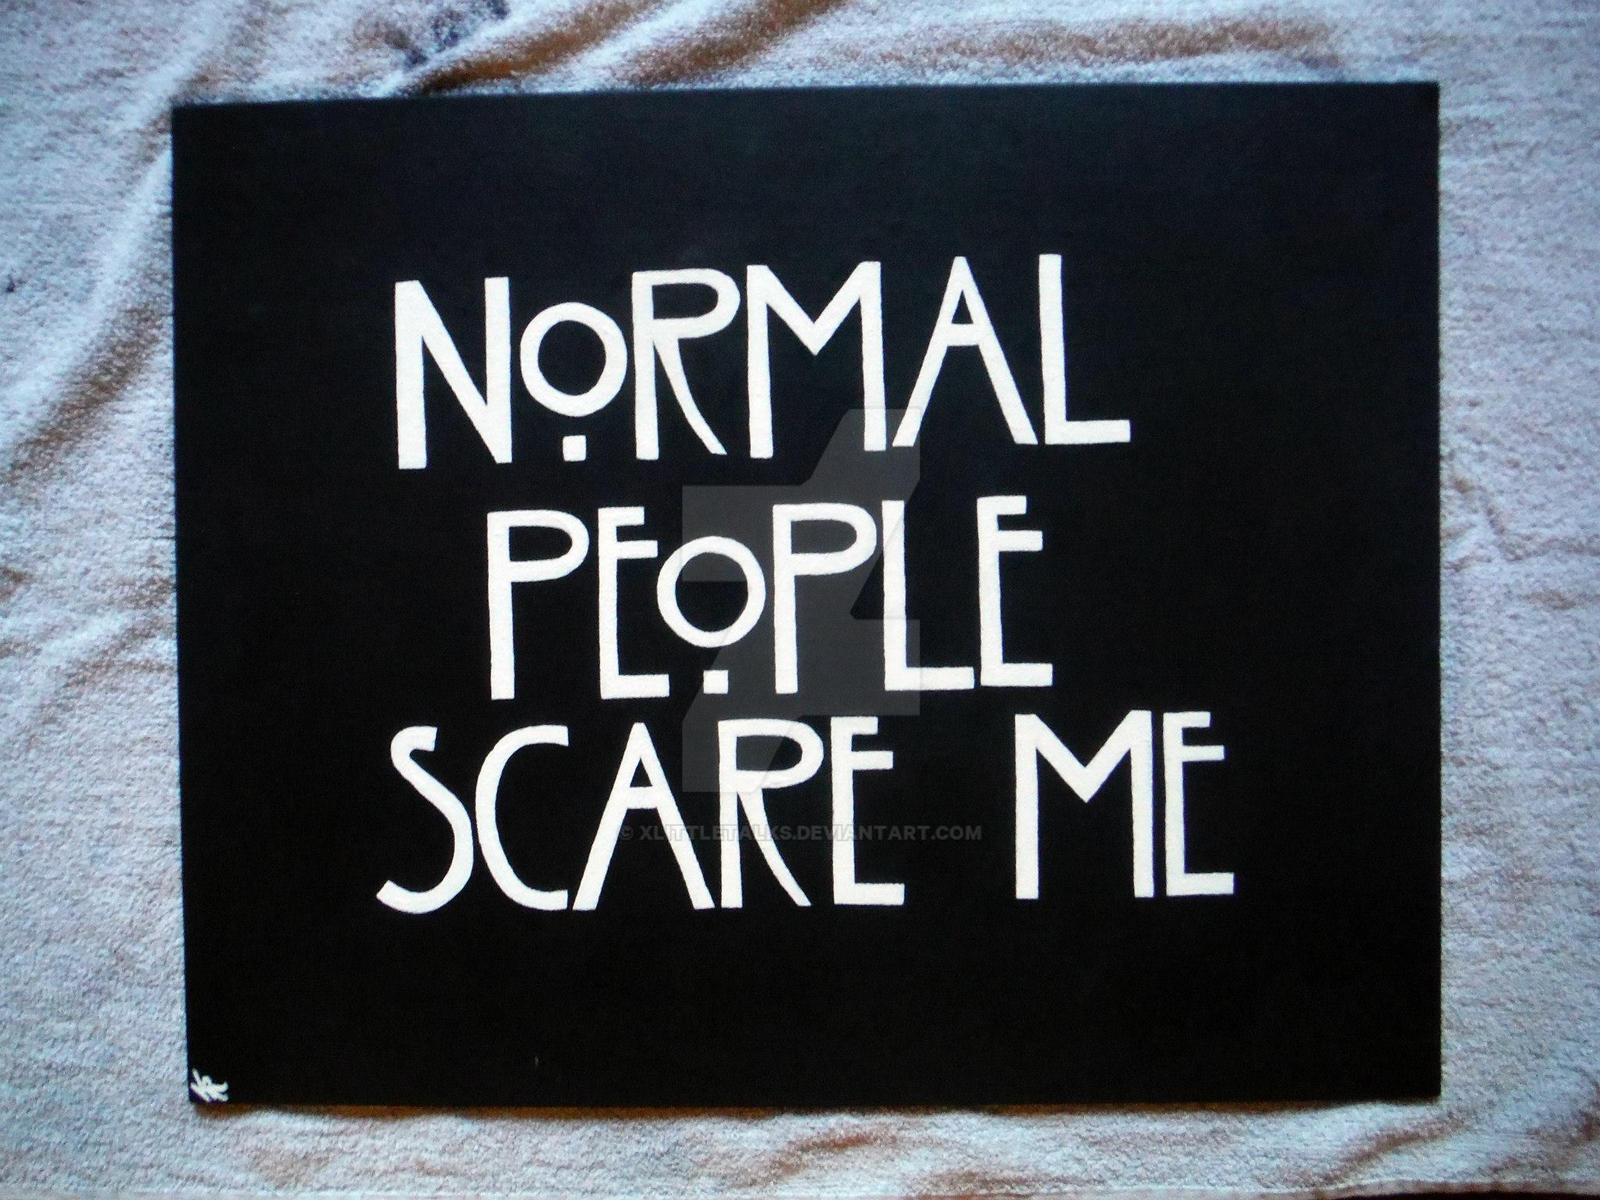 Normal People Scare Me By Xlittletalks On Deviantart